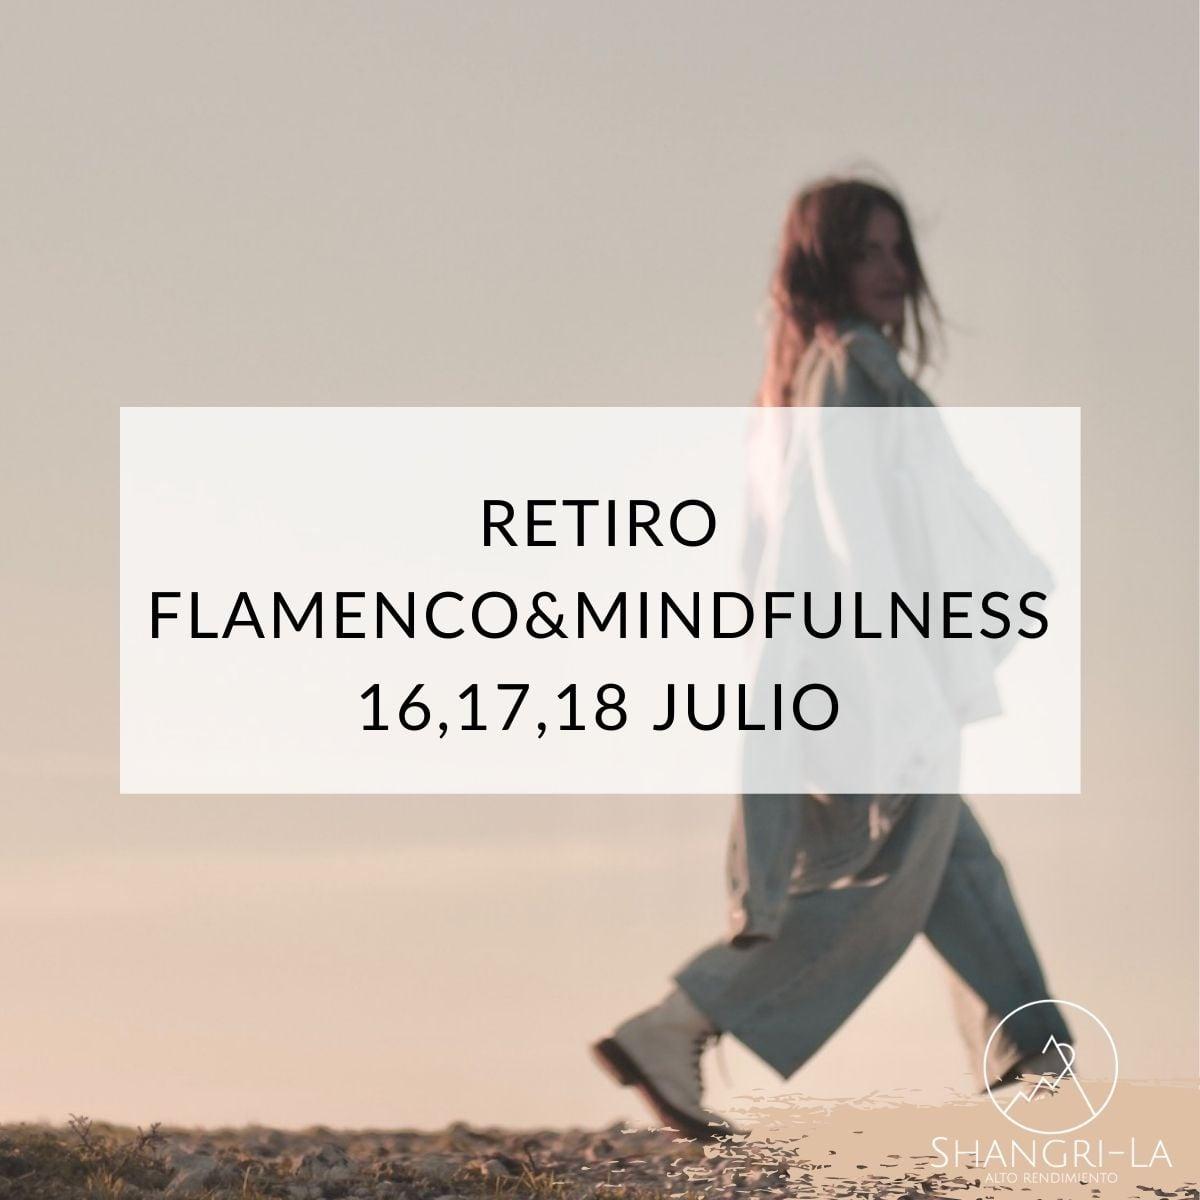 Retiro Flamenco & Mindfulness en Medina Sidonia, Cádiz